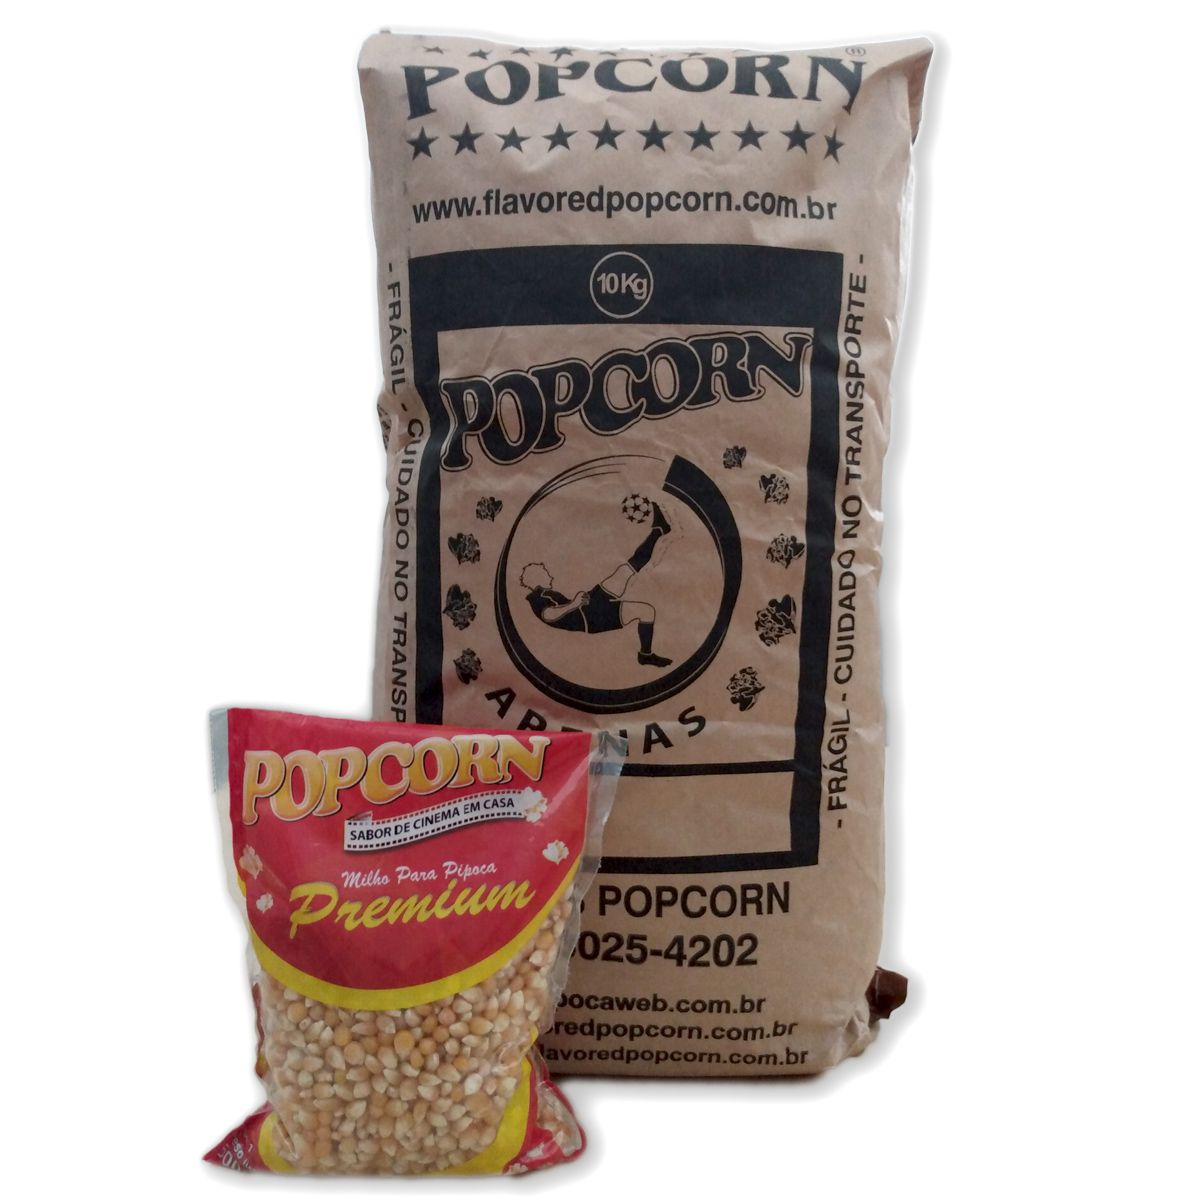 Milho para Pipoca Premium POPCORN 10kg